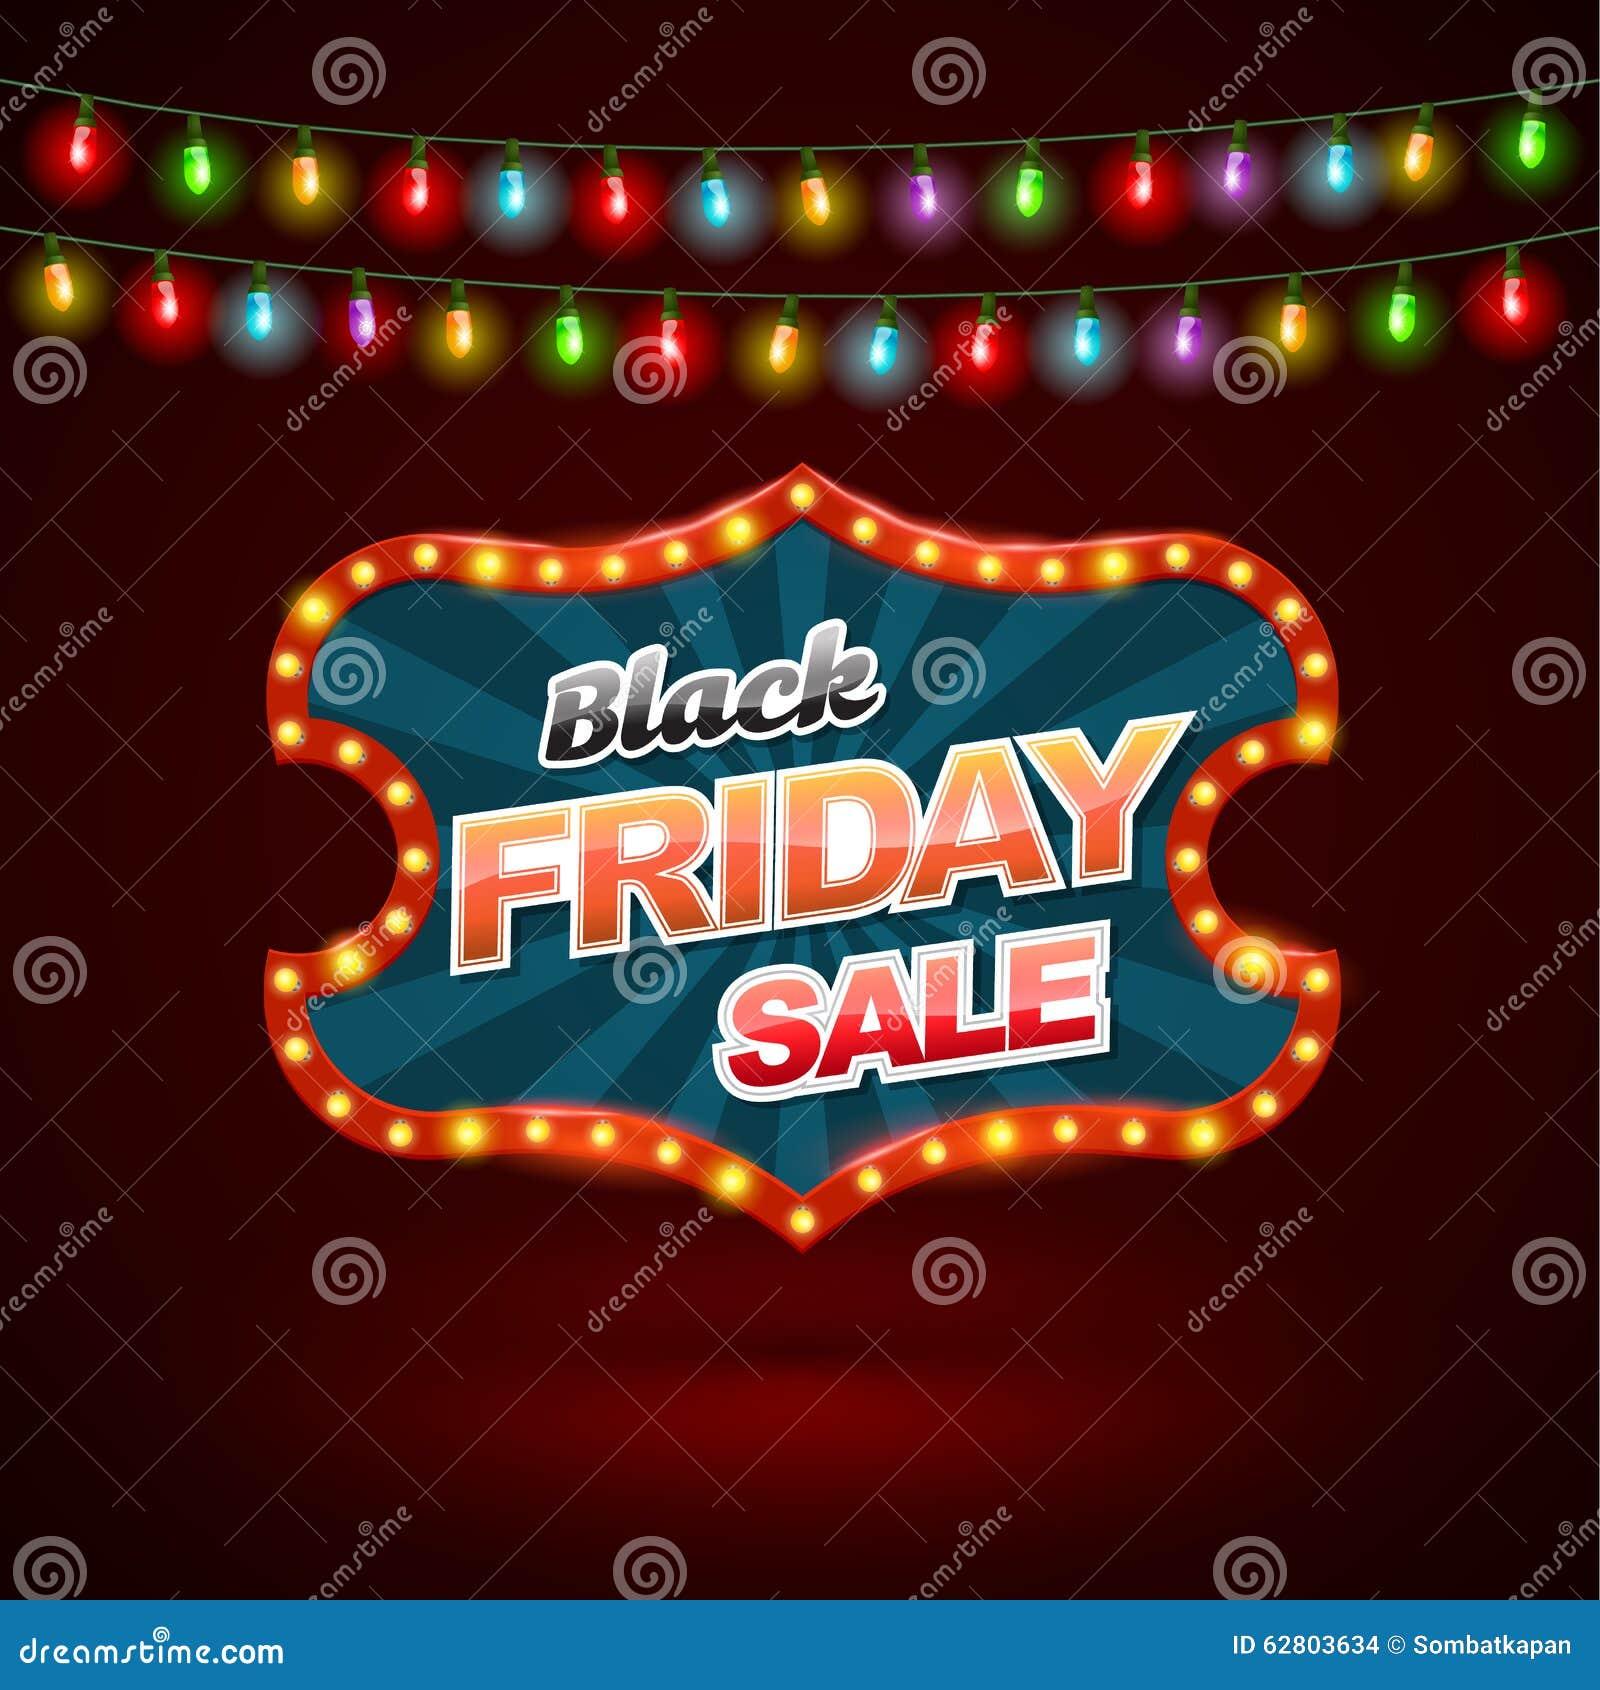 Black Friday Christmas Decoration Deals